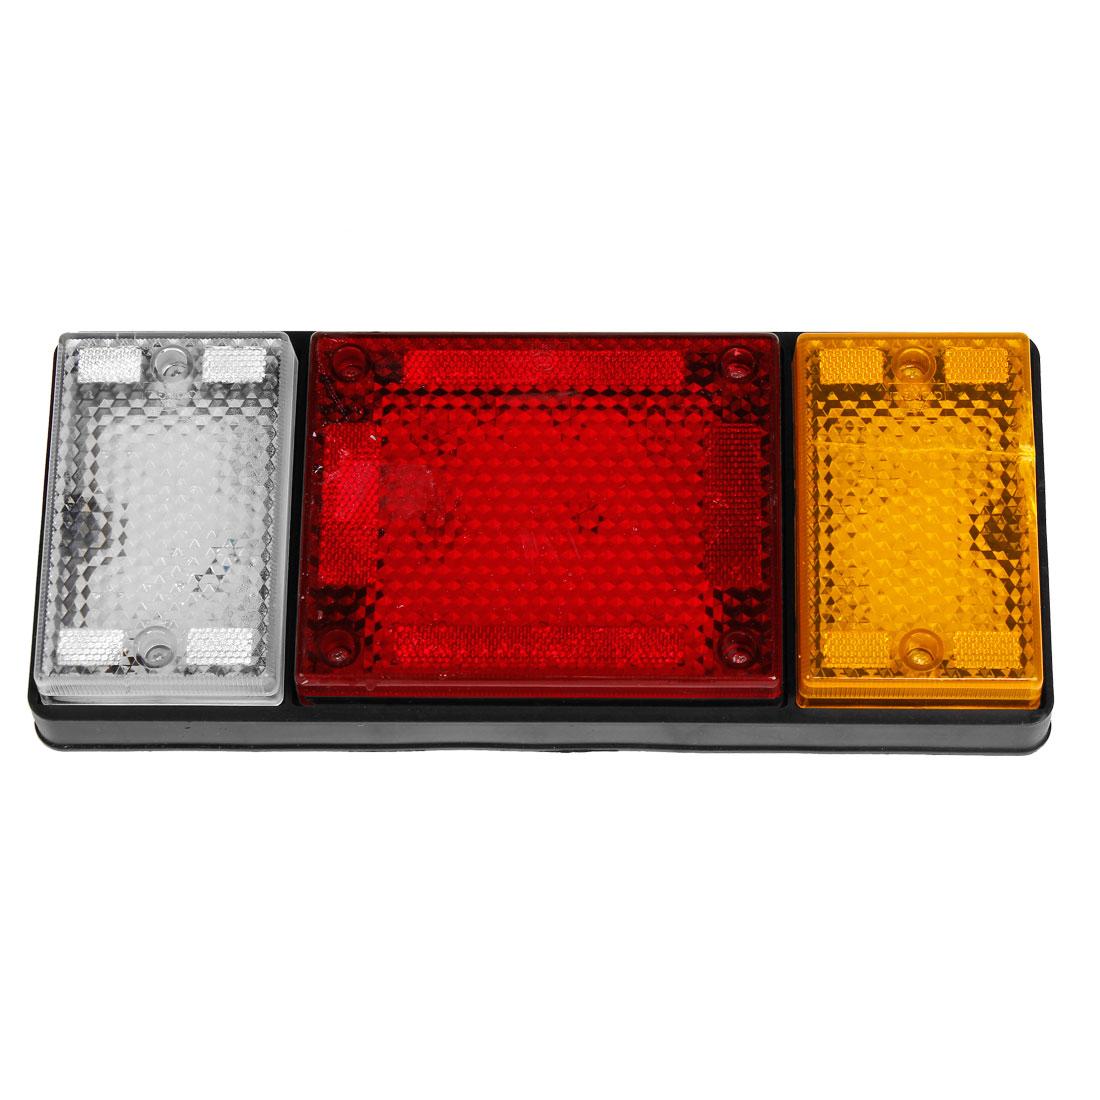 White Red Yellow LED Light Left Side Turn Rear Tail Lamp for Truck Trailer